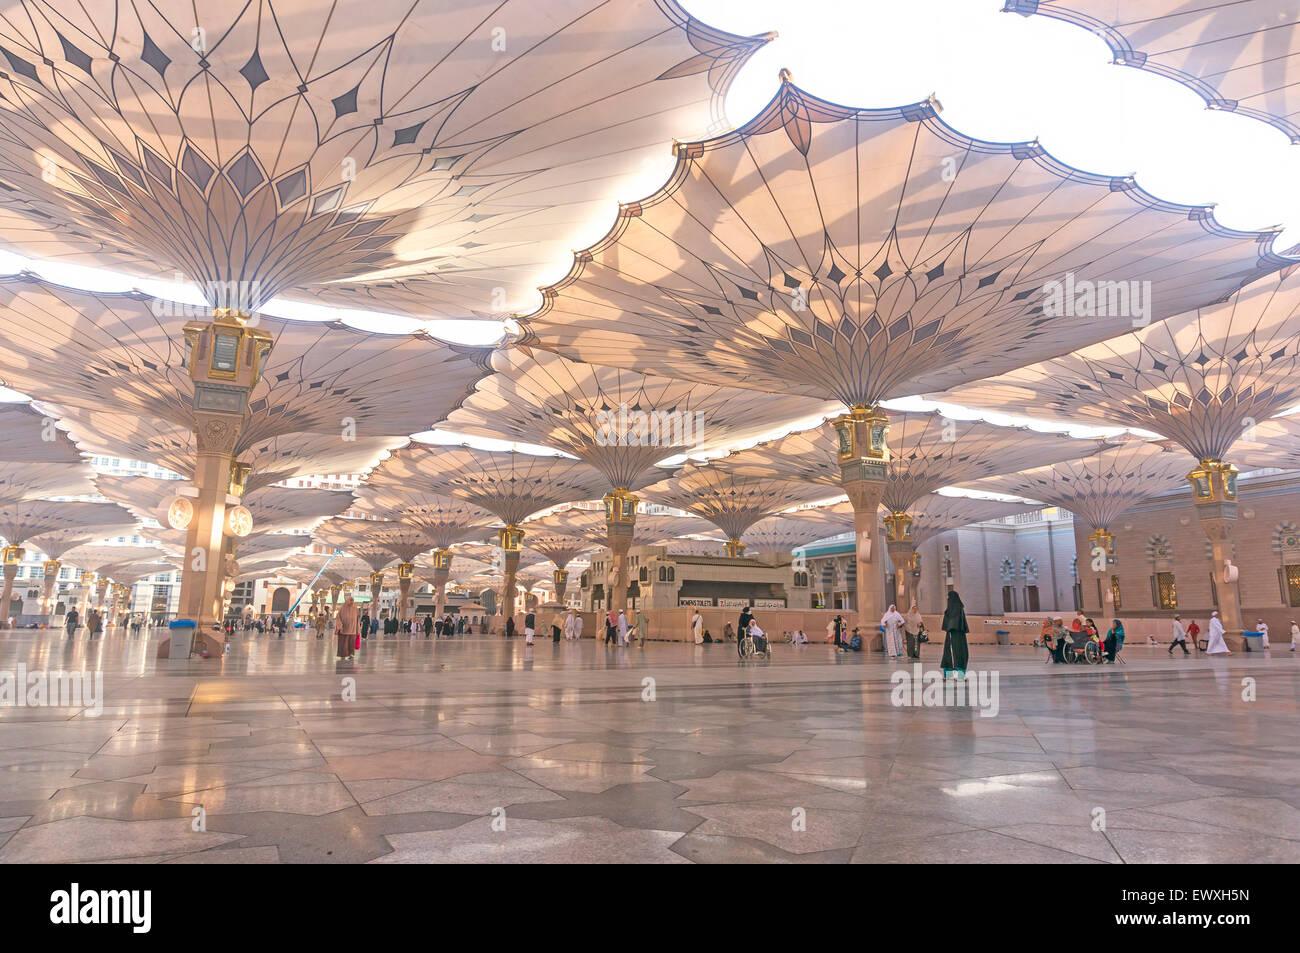 medina saudi arabia march 06 2015 pilgrims walk underneath